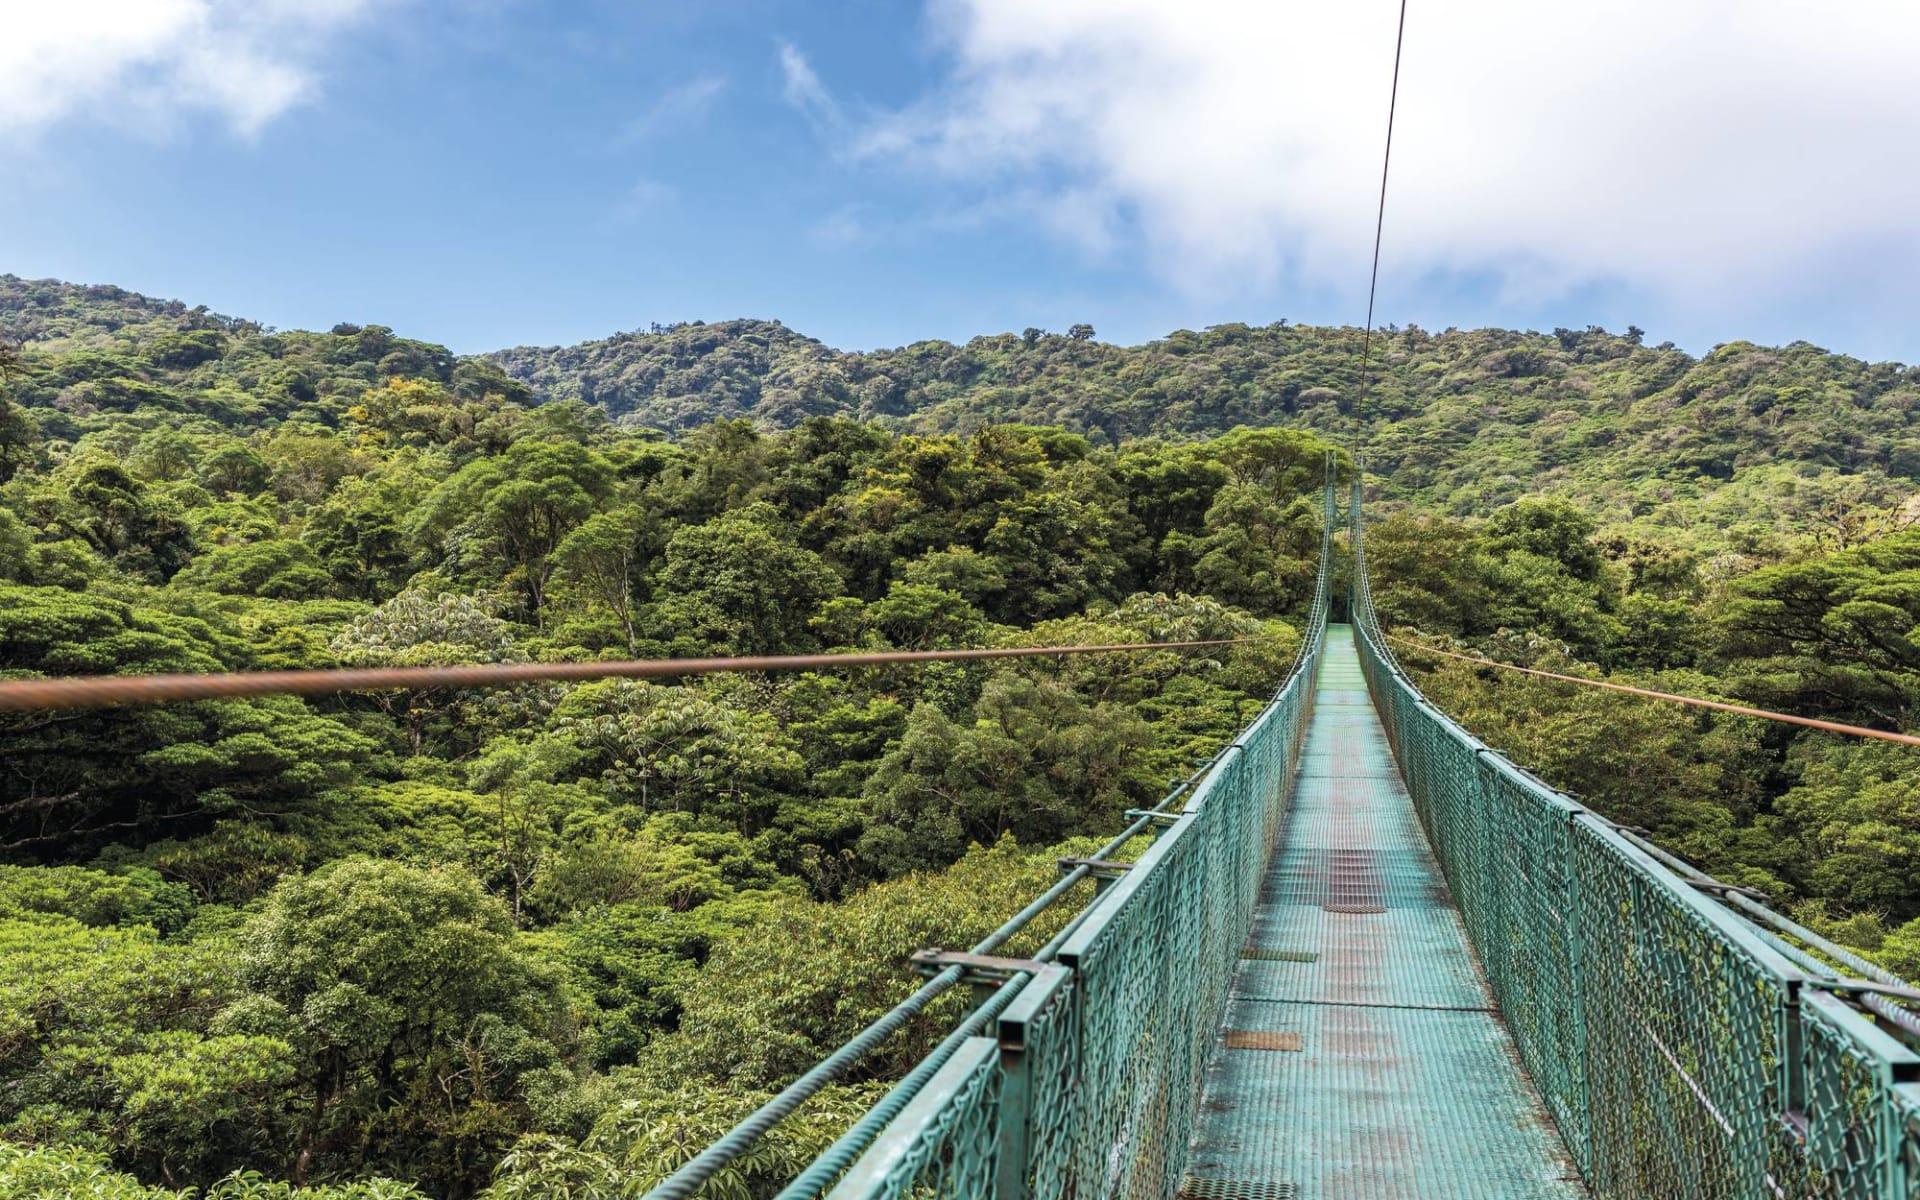 Mietwagenreise Costa Rica Classic ab San José City: Costa Rica - Monteverde - Hängebrücke